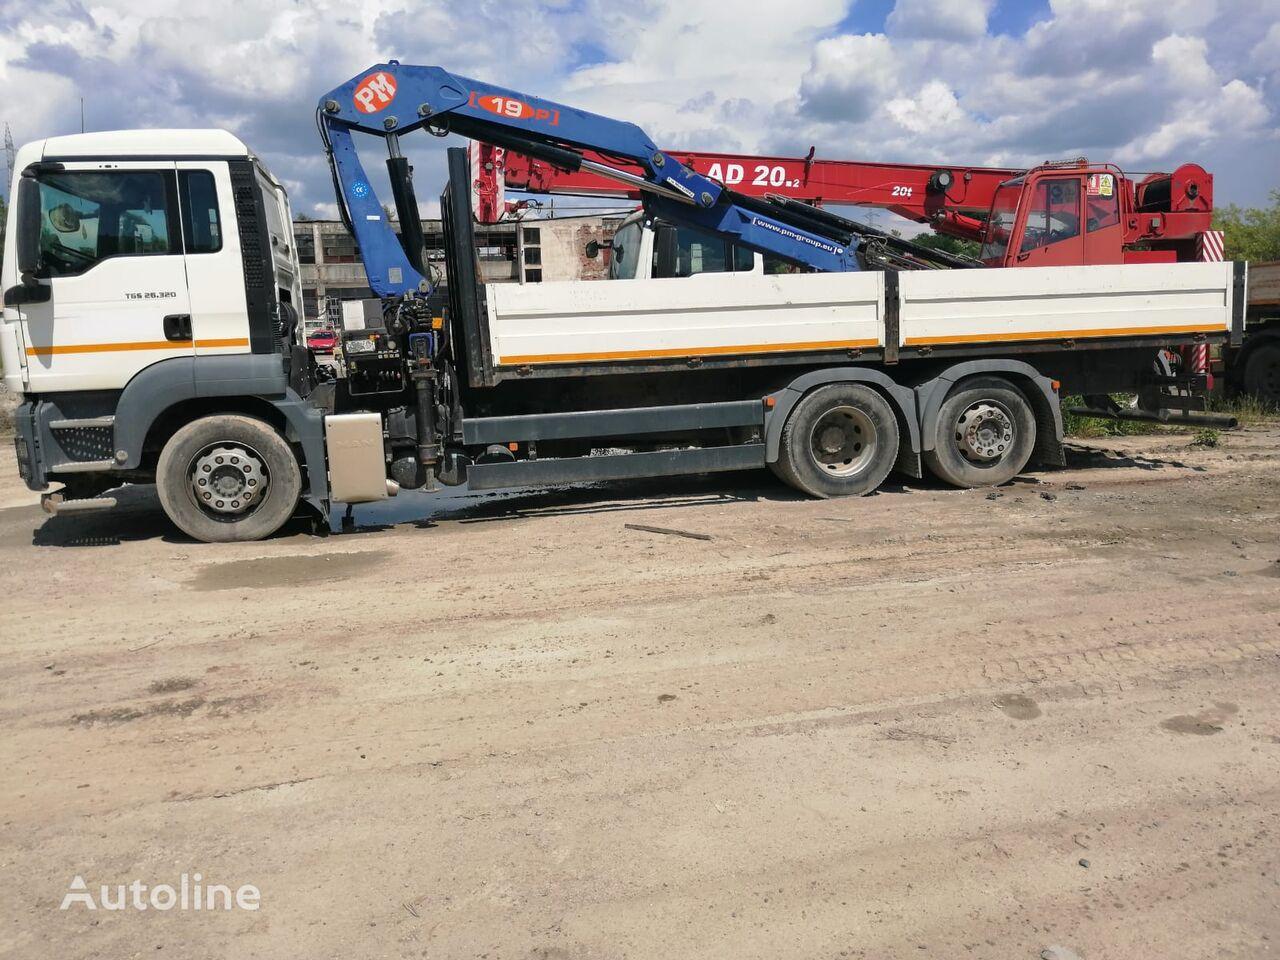 MAN TGS 26.320 hook lift truck